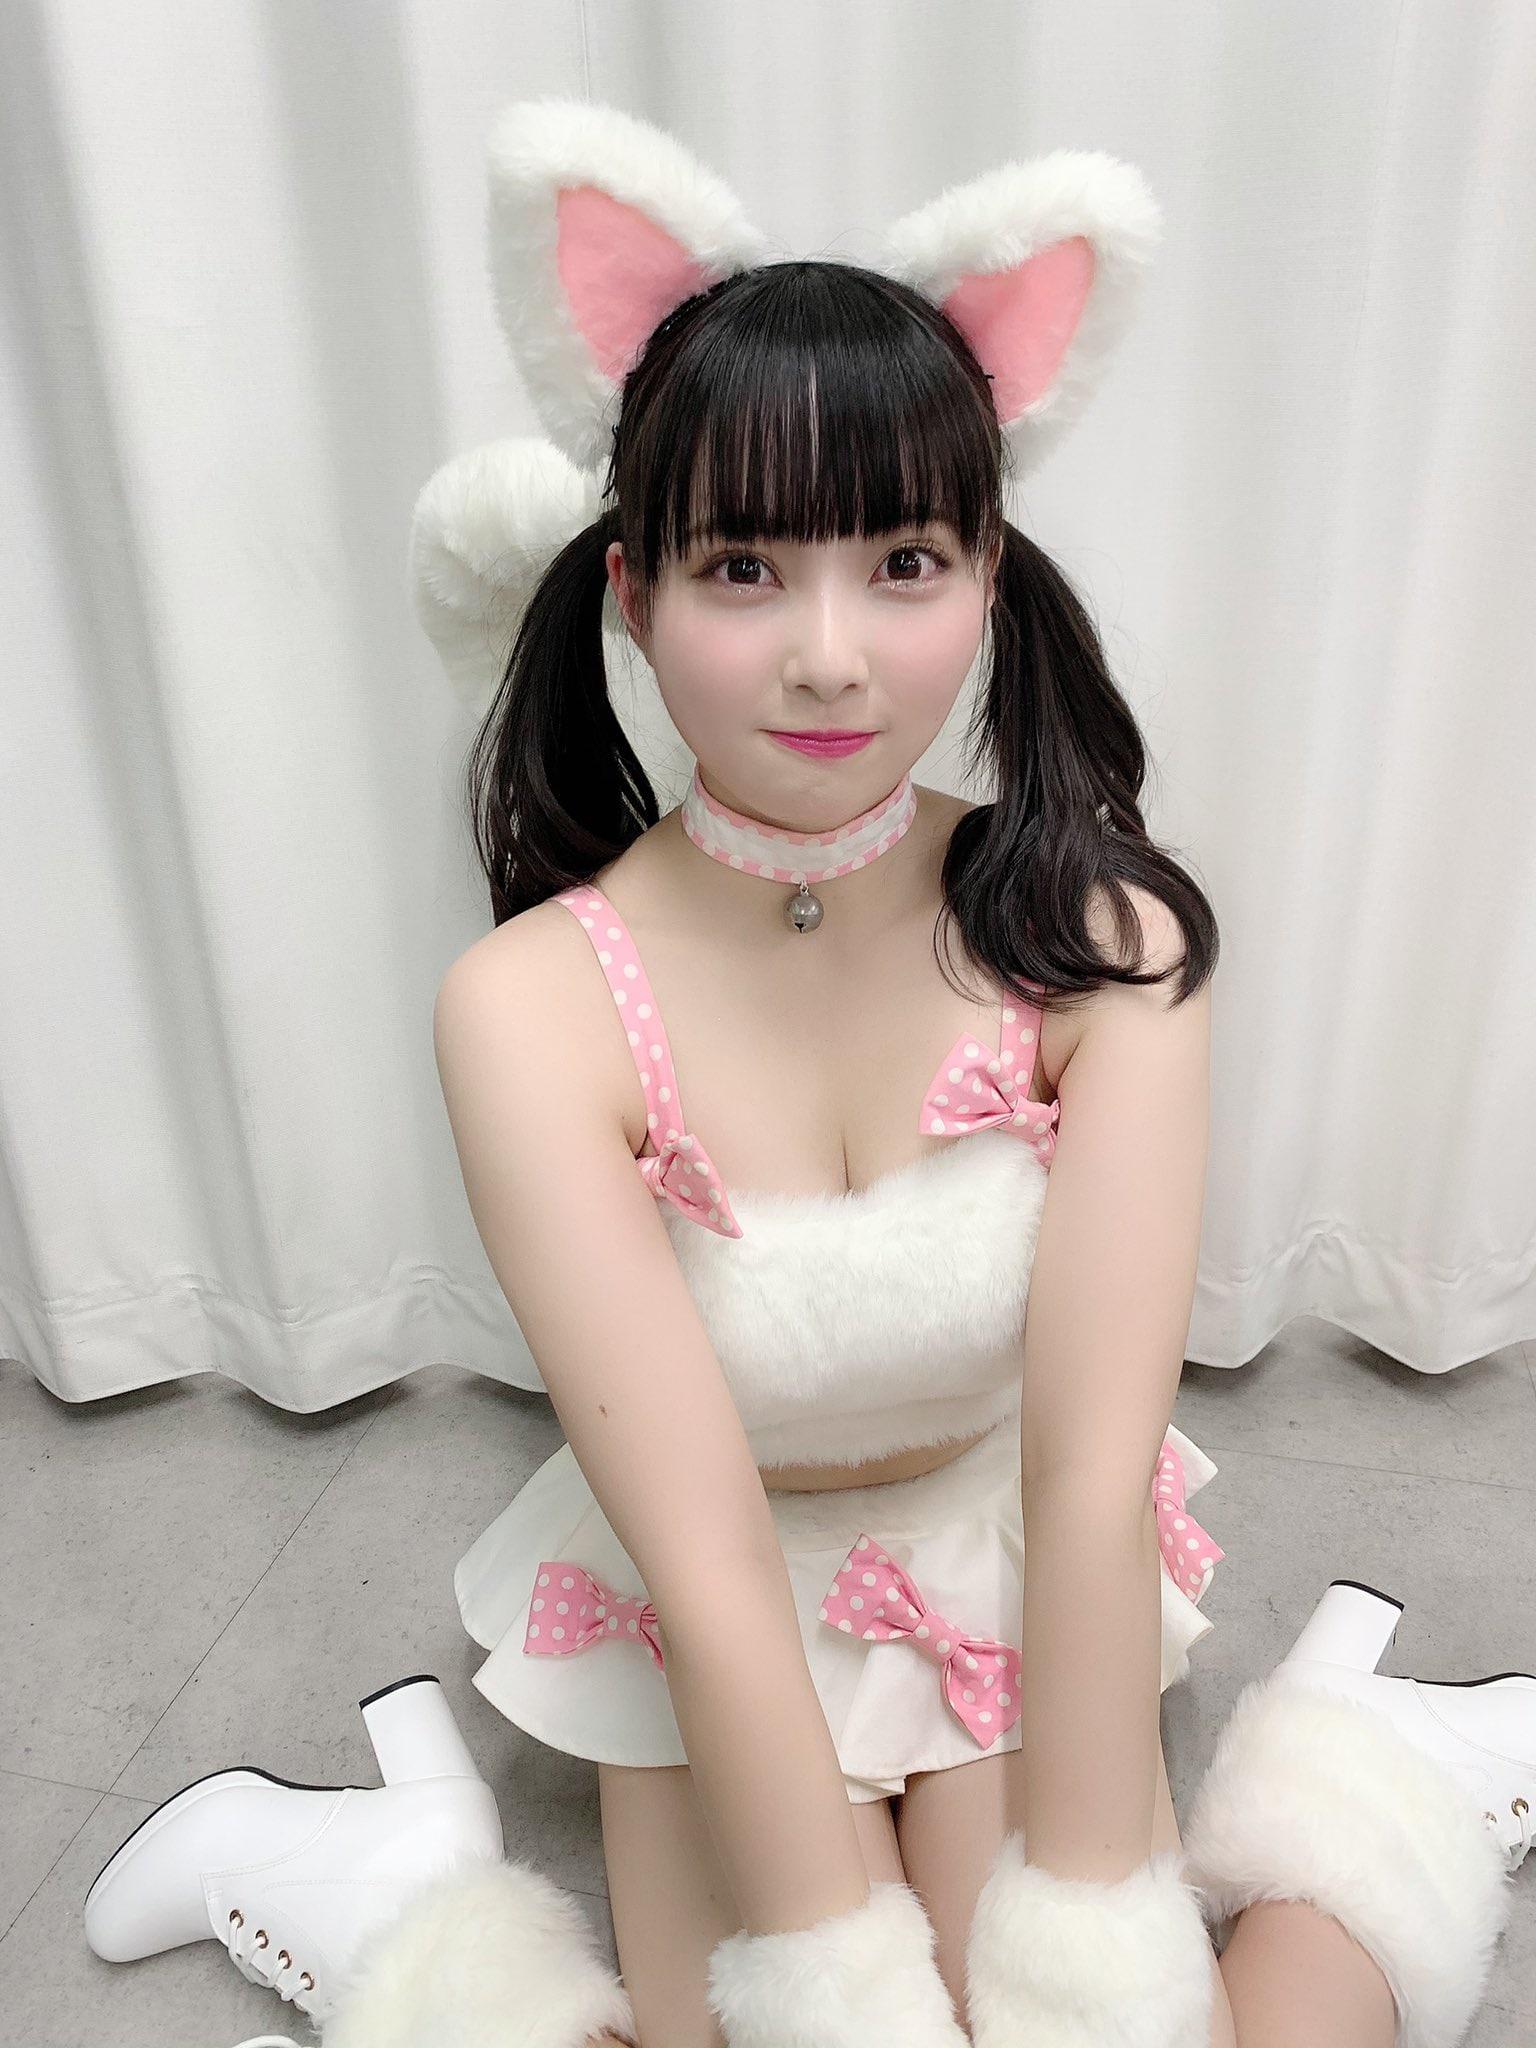 NMB48堀詩音「飼わせてください…」猫の日にセクシーな猫耳衣装を公開【画像4枚】の画像003